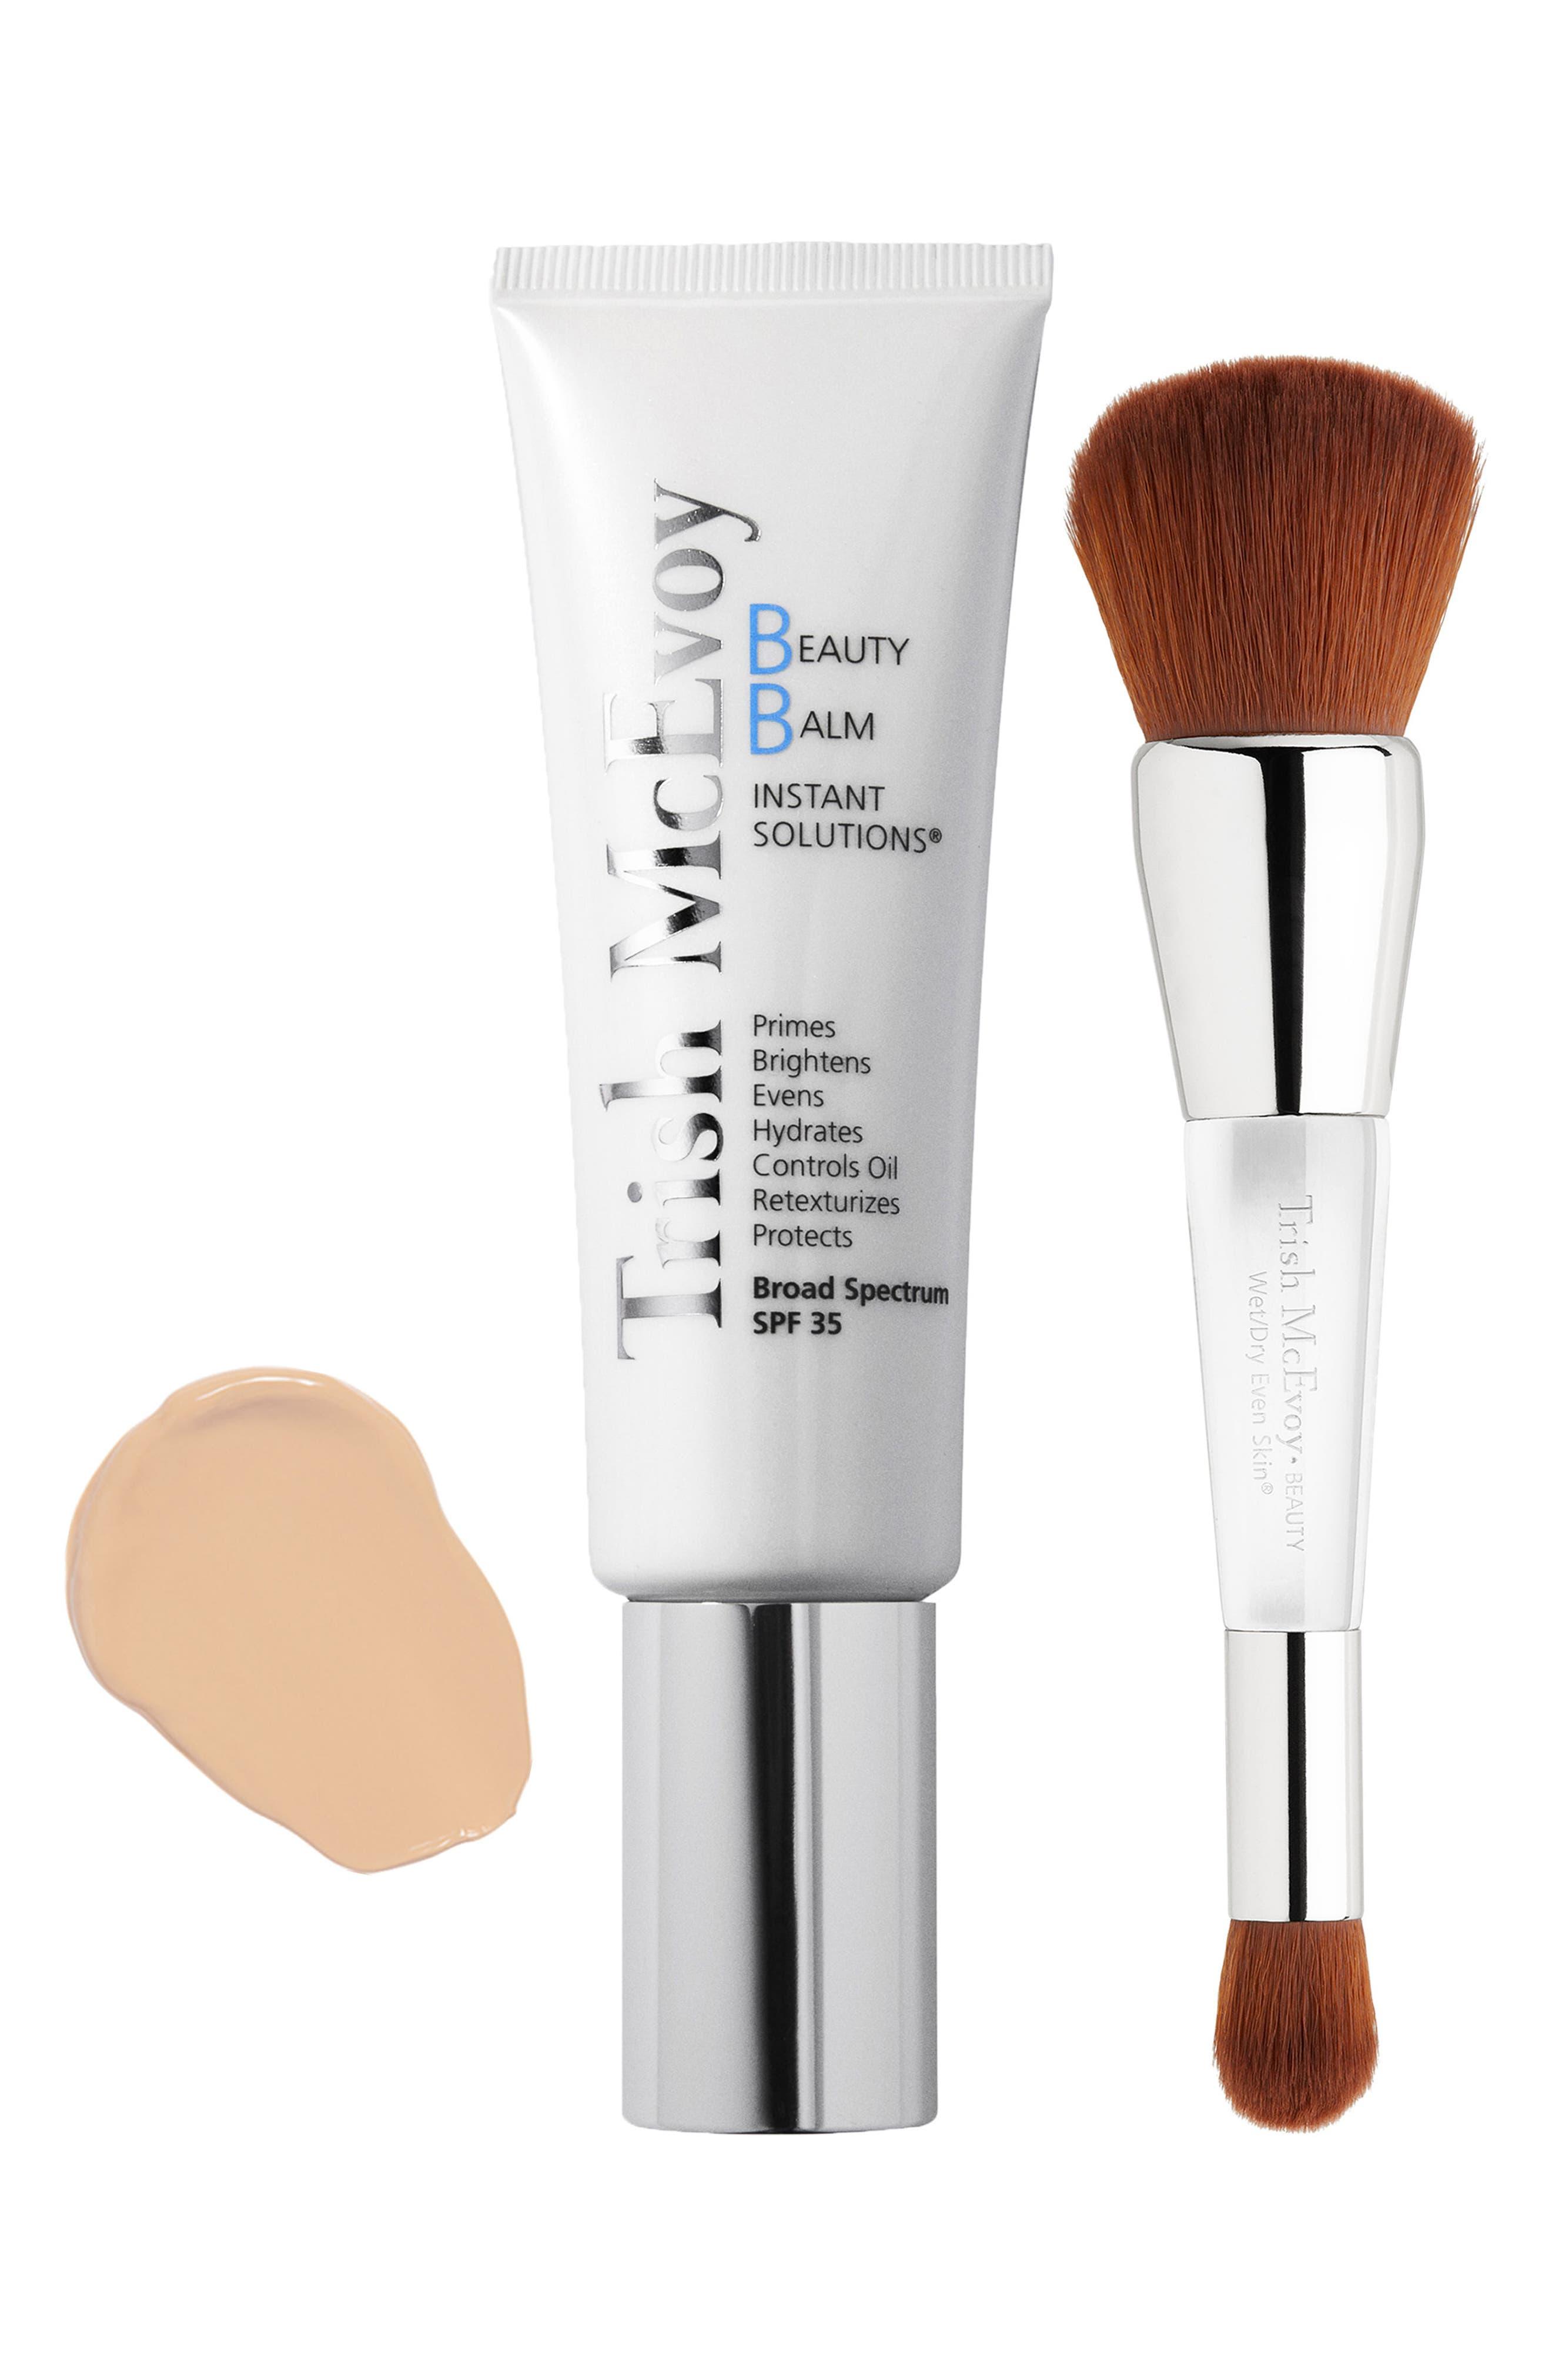 Beauty Balm & Wet/Dry Brush Set,                             Main thumbnail 1, color,                             SHADE 1